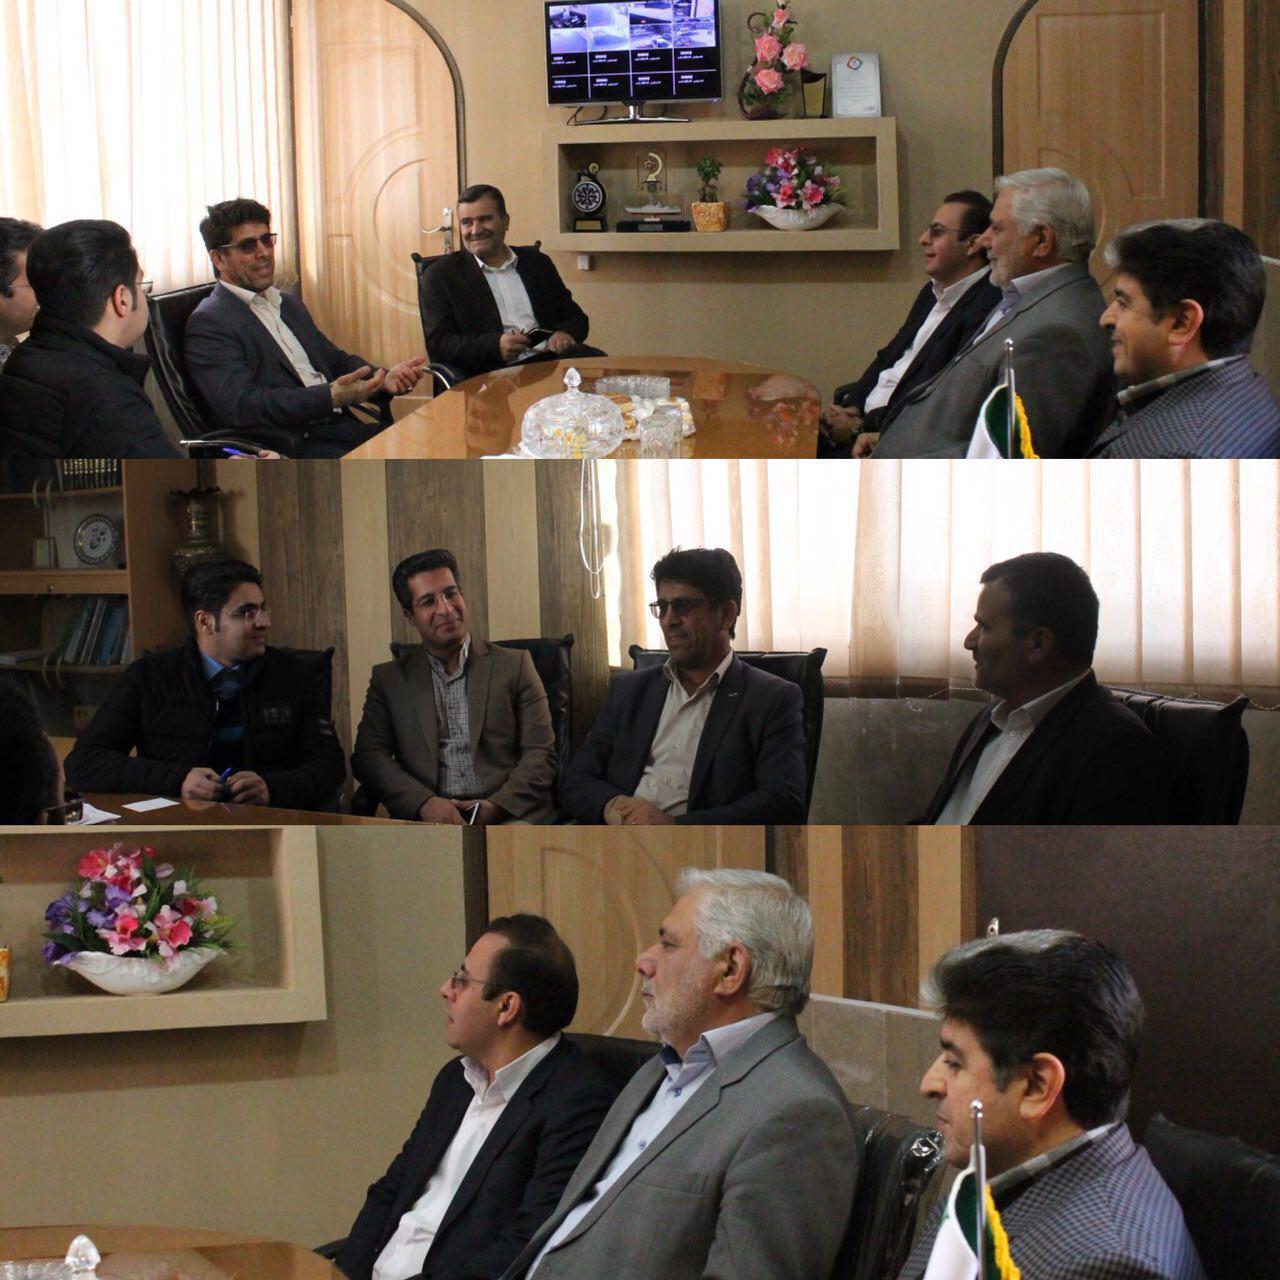 باشگاه خبرنگاران -حضور رئيس فدراسيون ورزش هاى روستايى در سيرجان